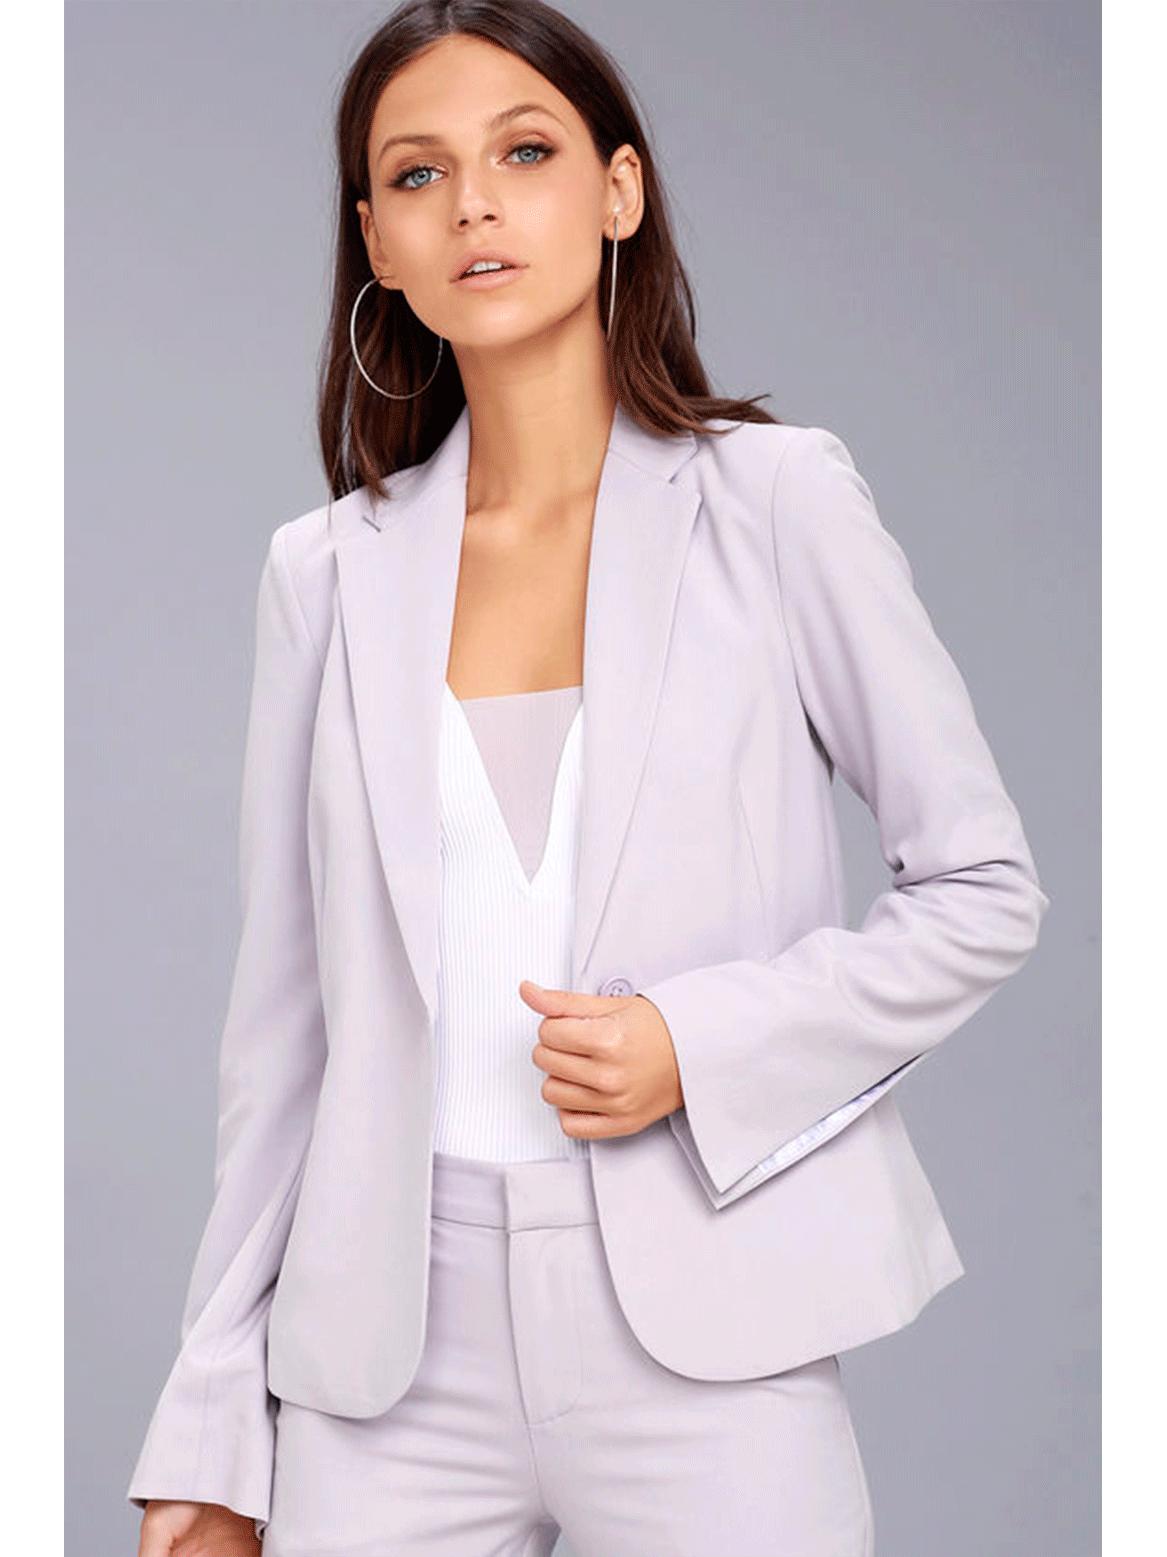 Outfit para oficina - Asesoría de imagen ejecutiva - Blazer Marina Lavender  - Lulus - VIPSOUL